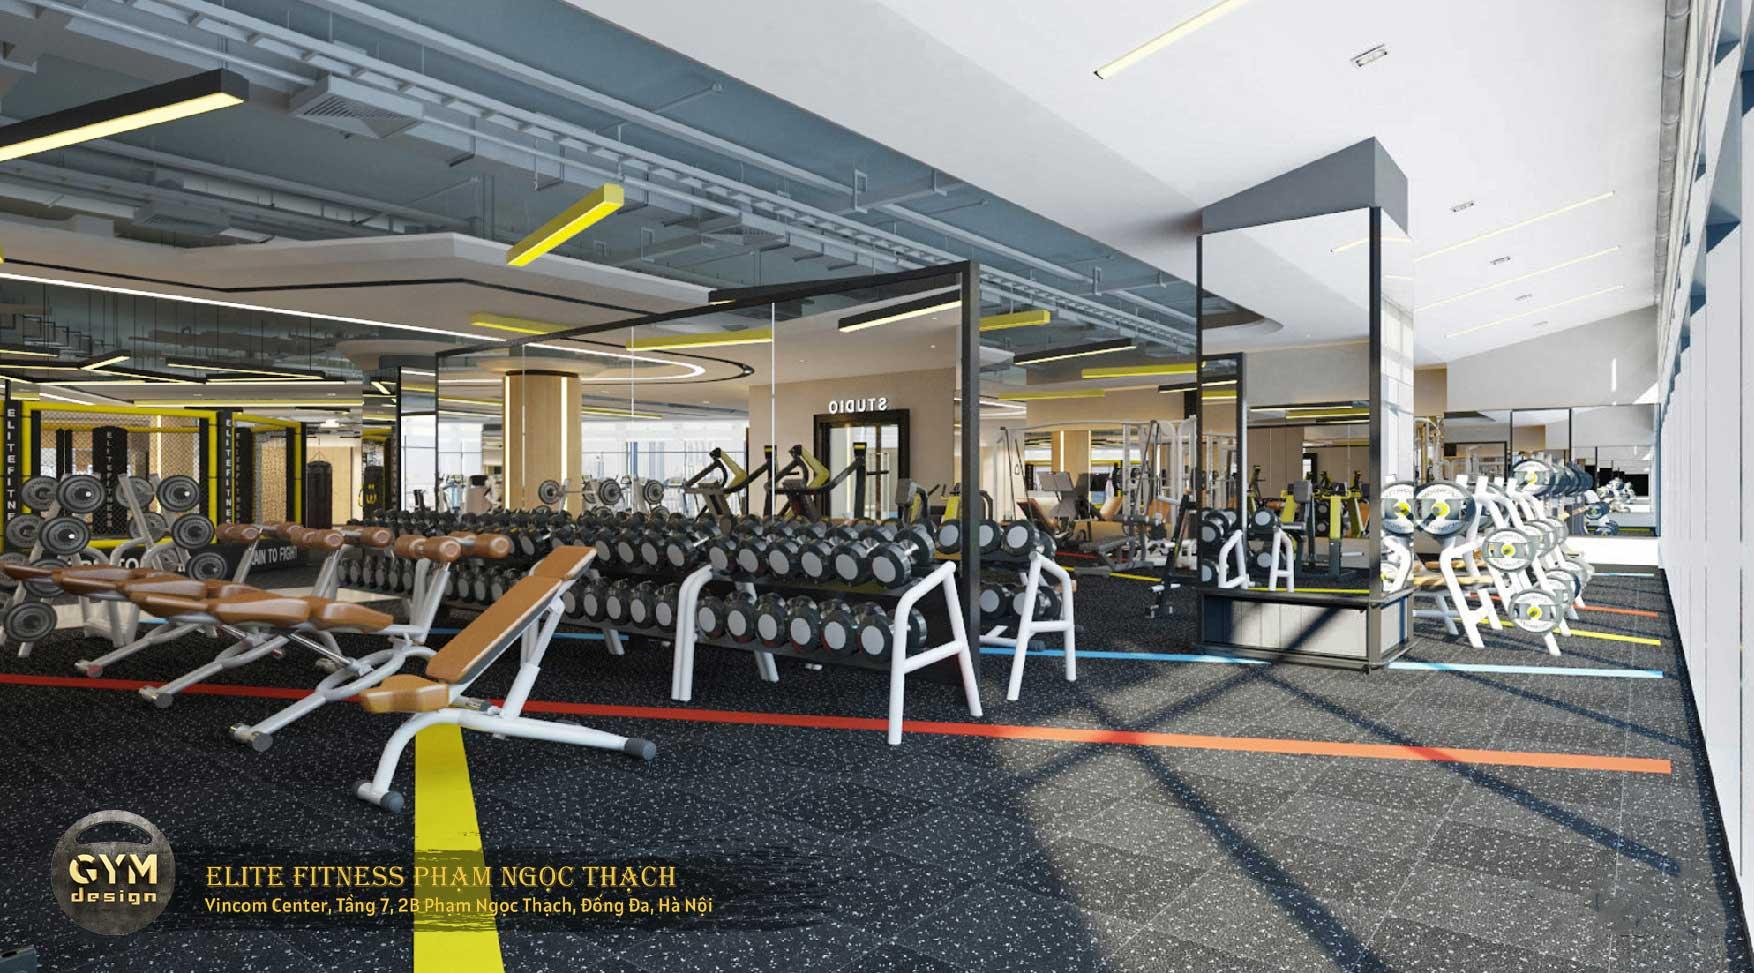 du-an-elite-fitness-pham-ngoc-thach-31